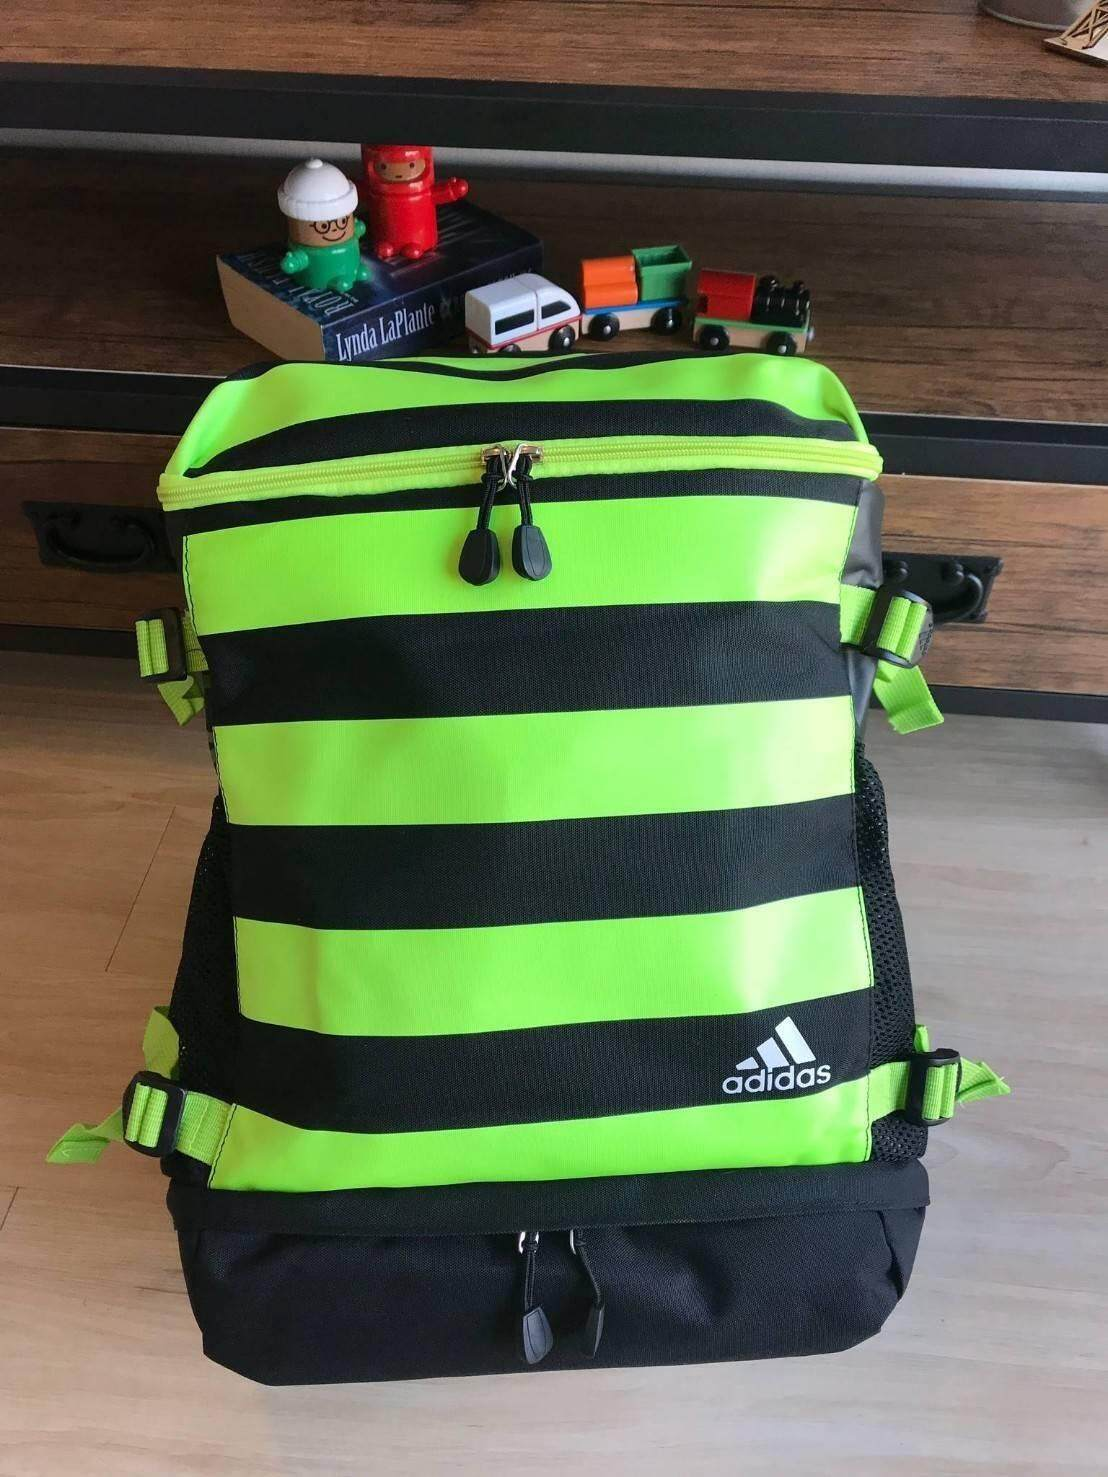 adc9460acb52 Adidas Contracted Large Backpack อีกหนึ่งคอลเลคชั่นสำหรับนักเดินทาง (